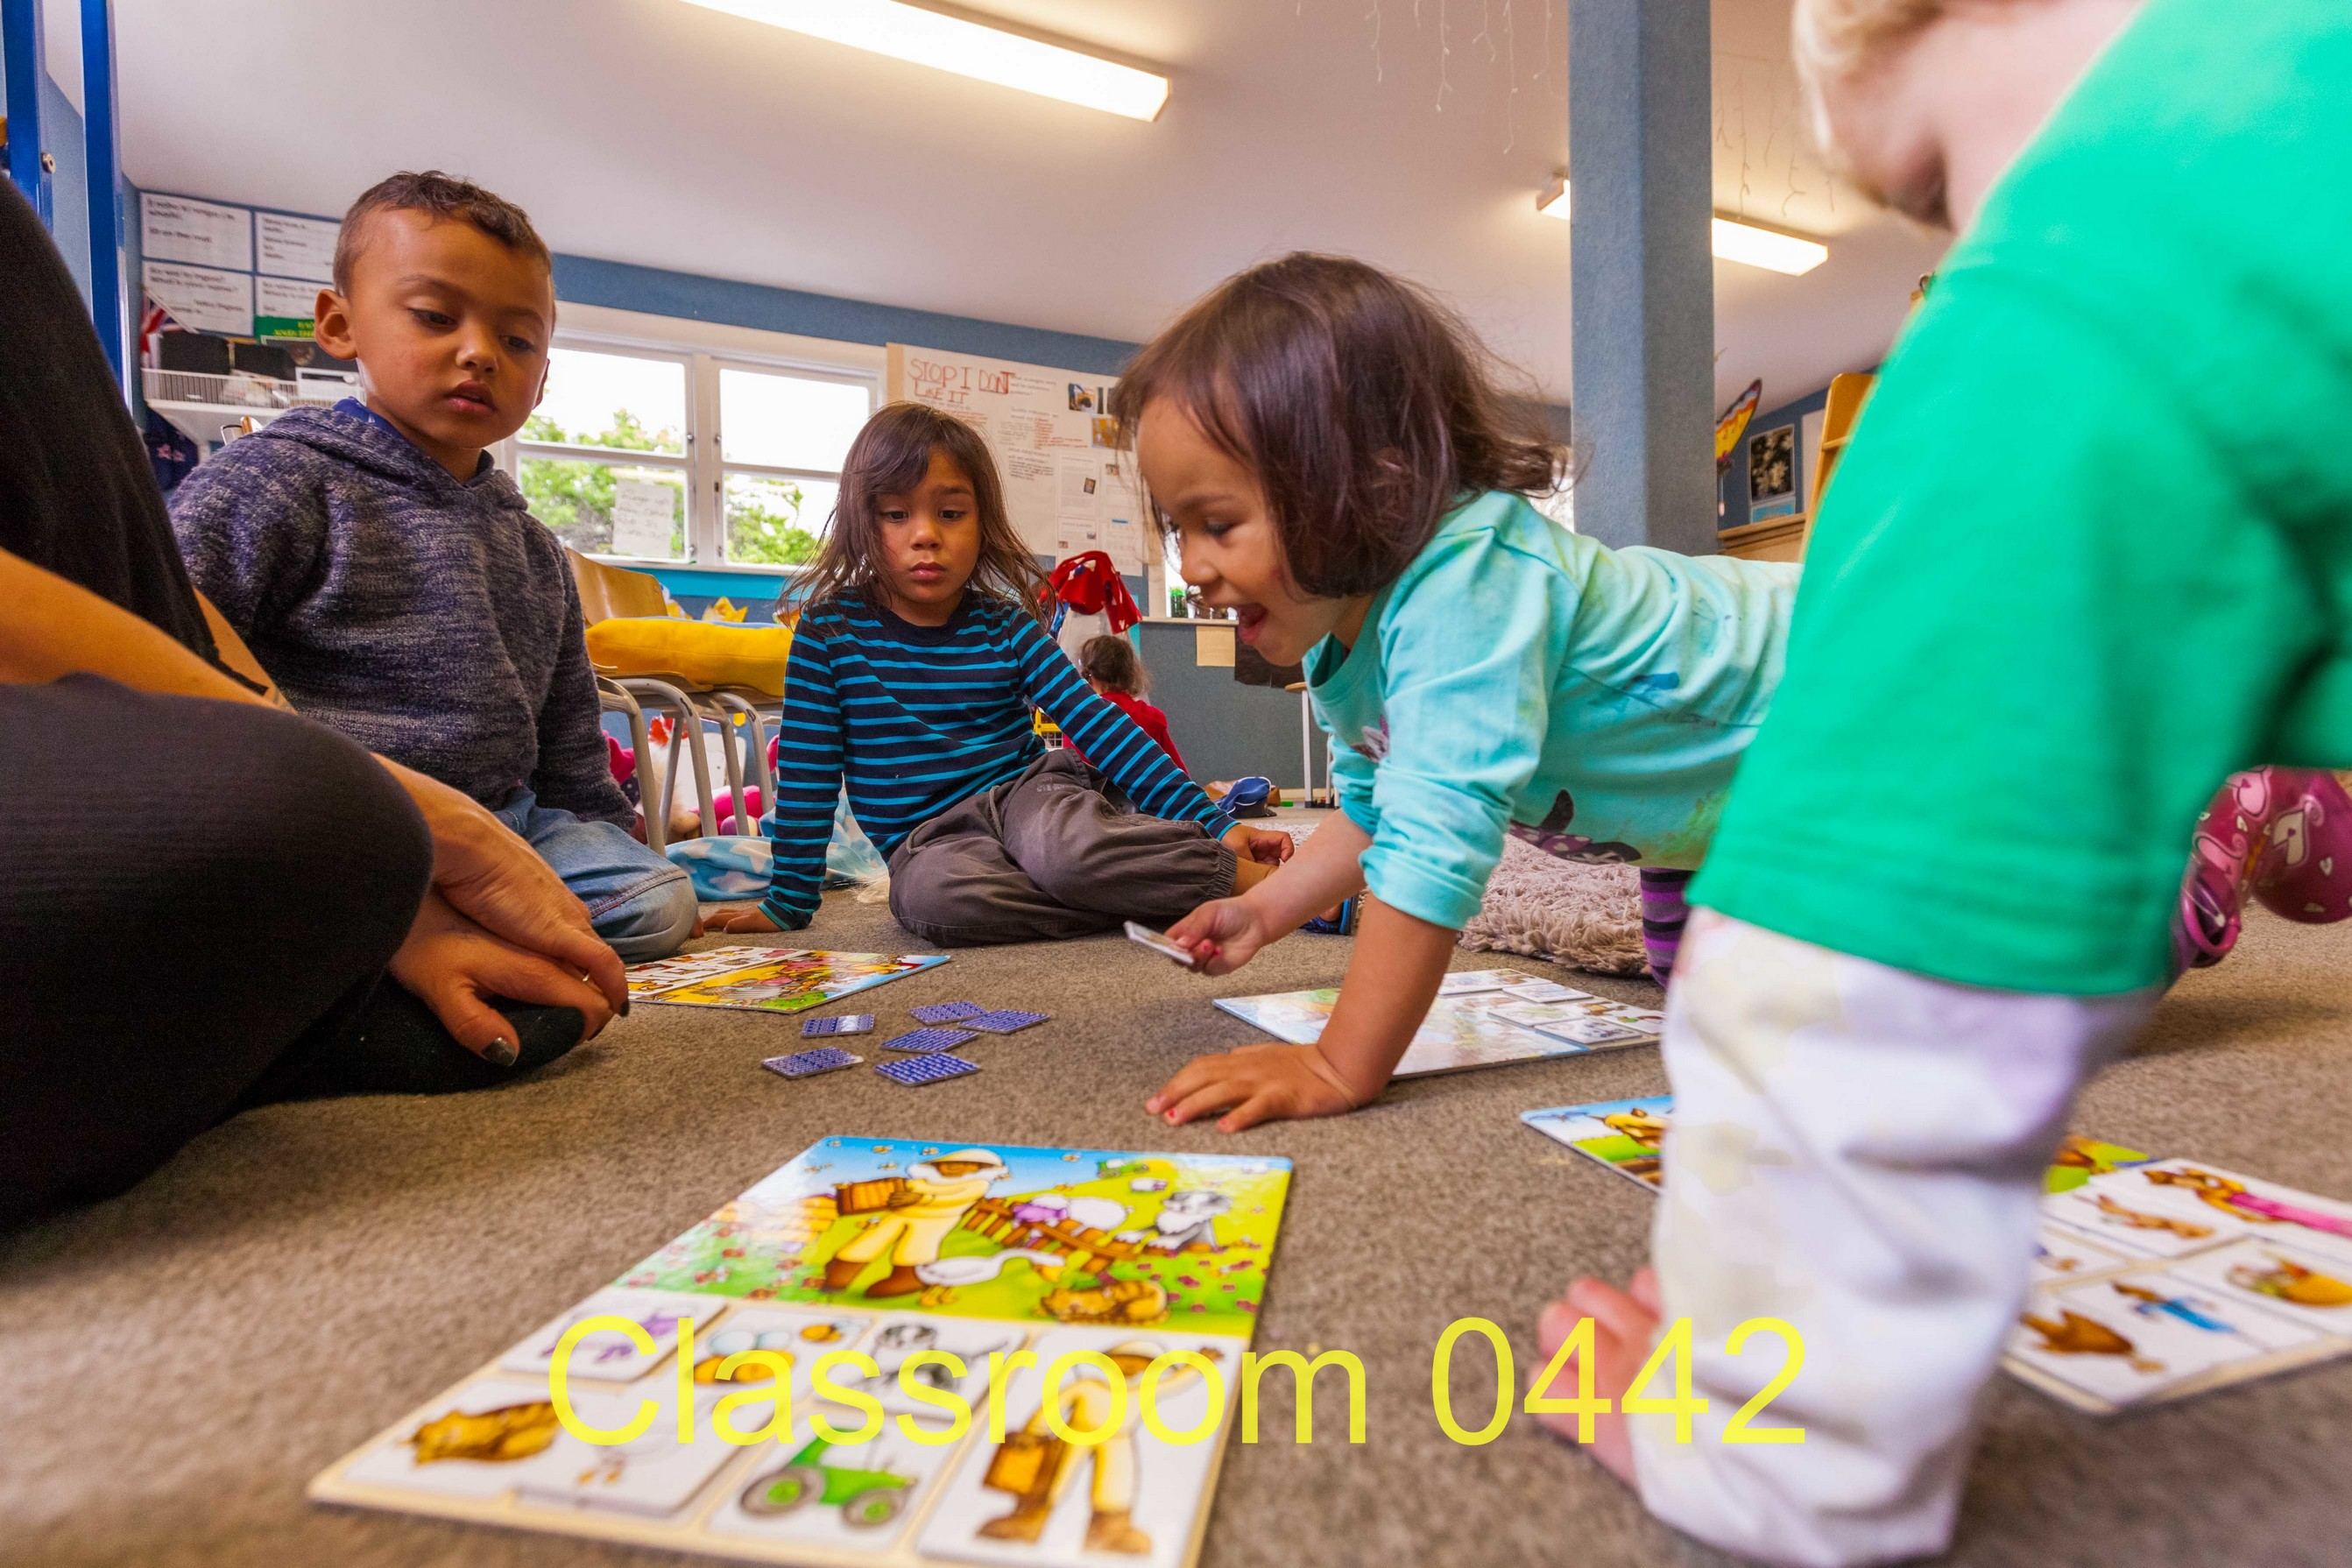 Classroom 0442